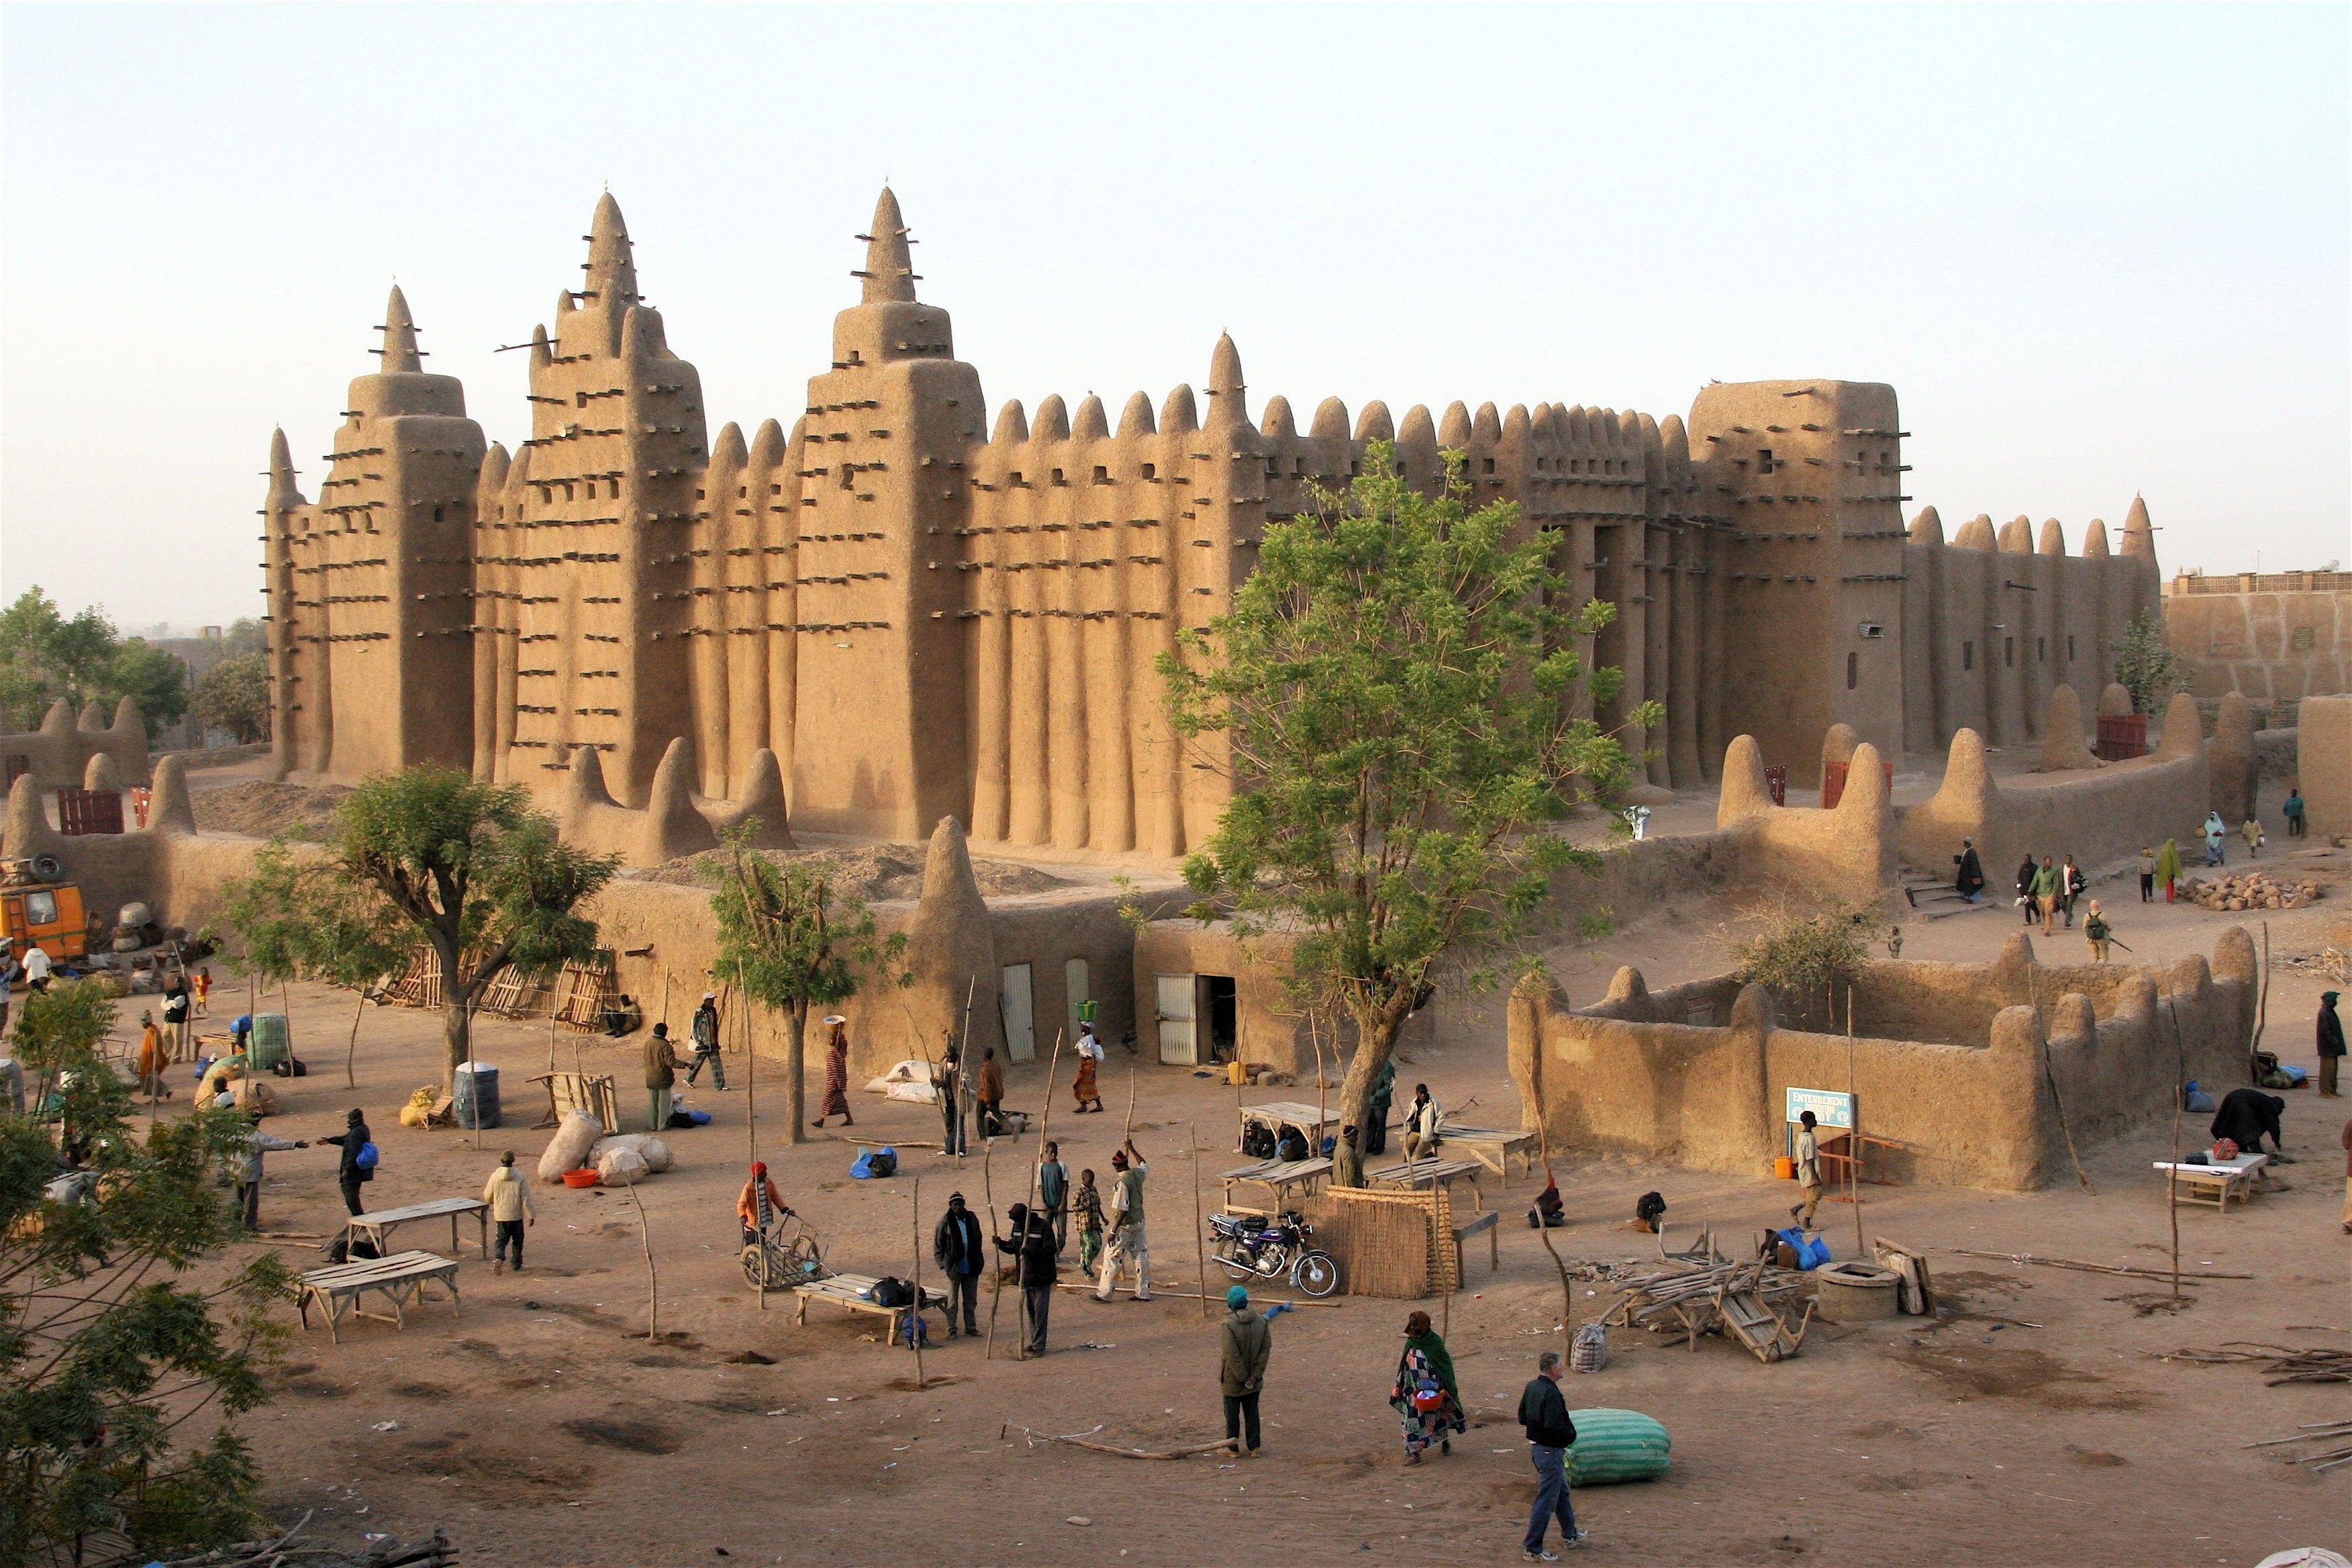 Djenne Mali Http Www Lonelyplanet Com Mali Niger River Route